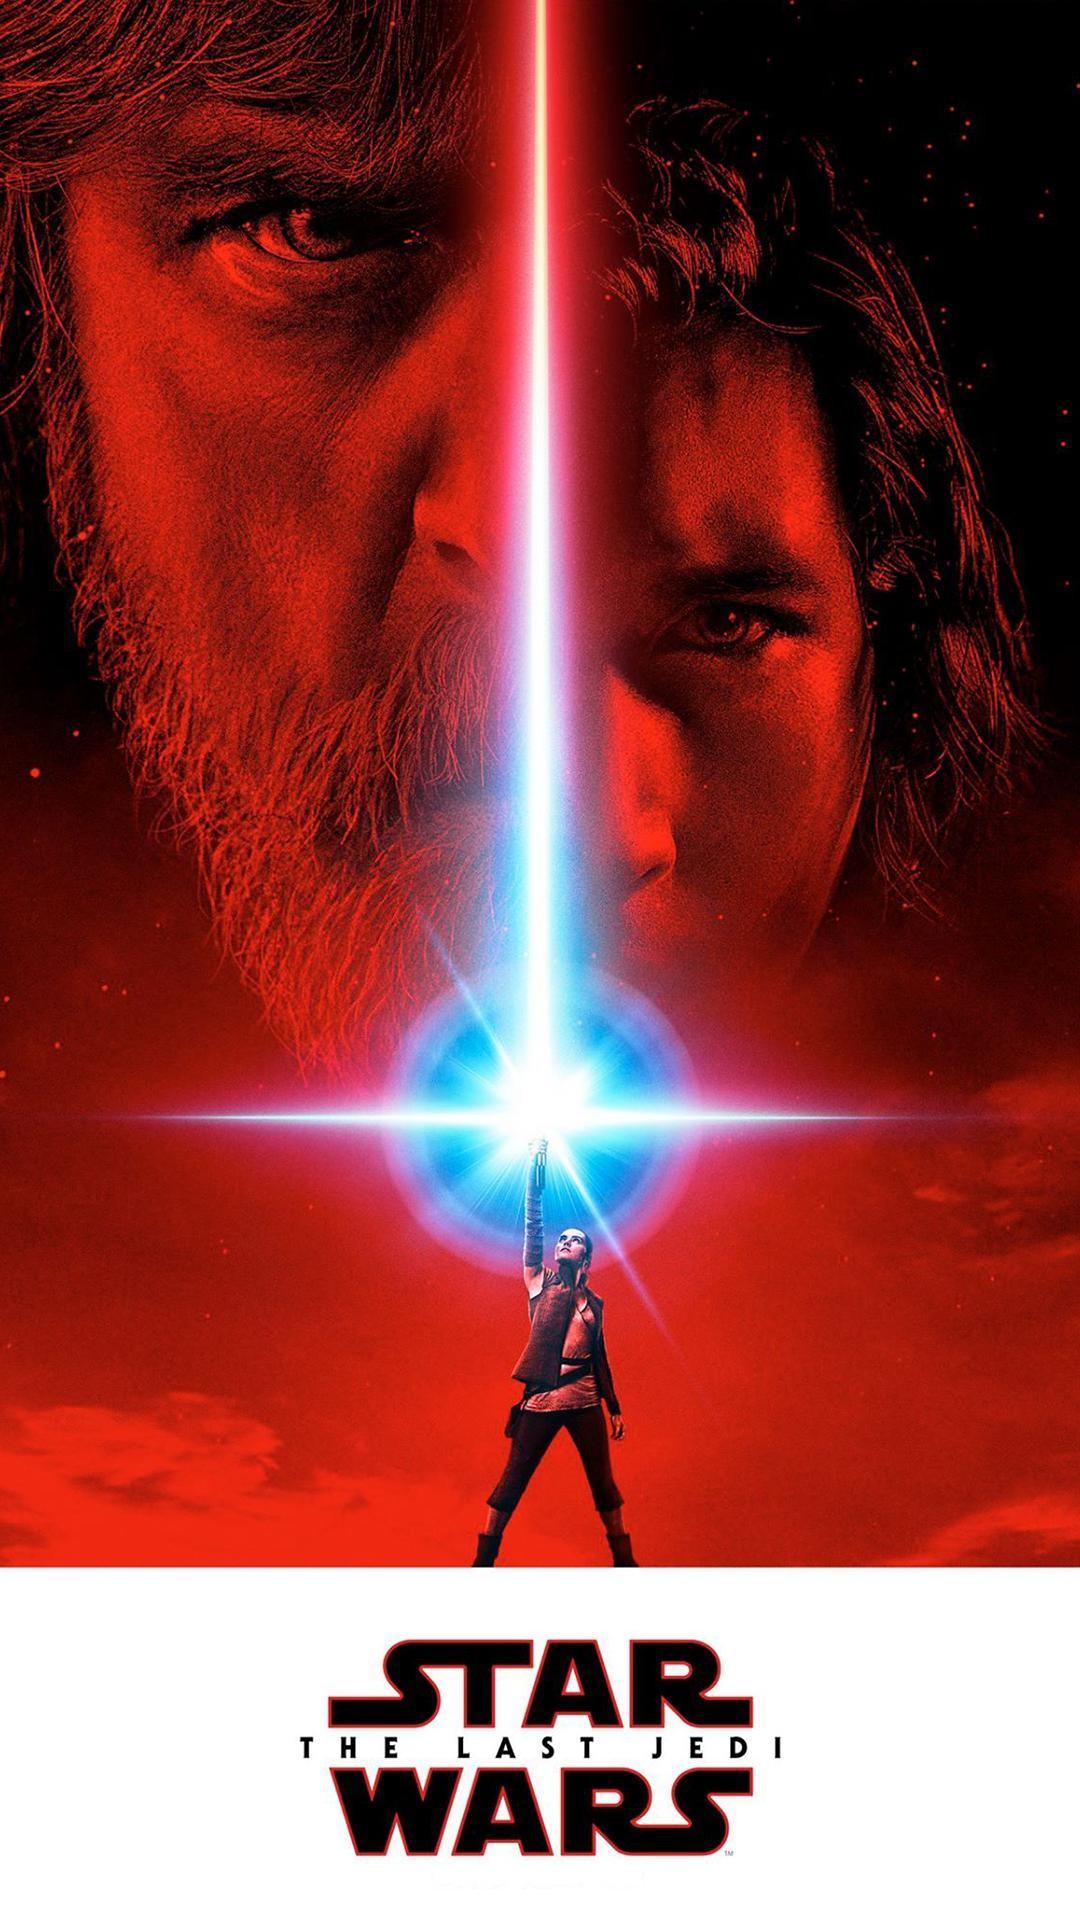 Star Wars – Episode VIII: The Last Jedi [1080×1920] Need #iPhone #